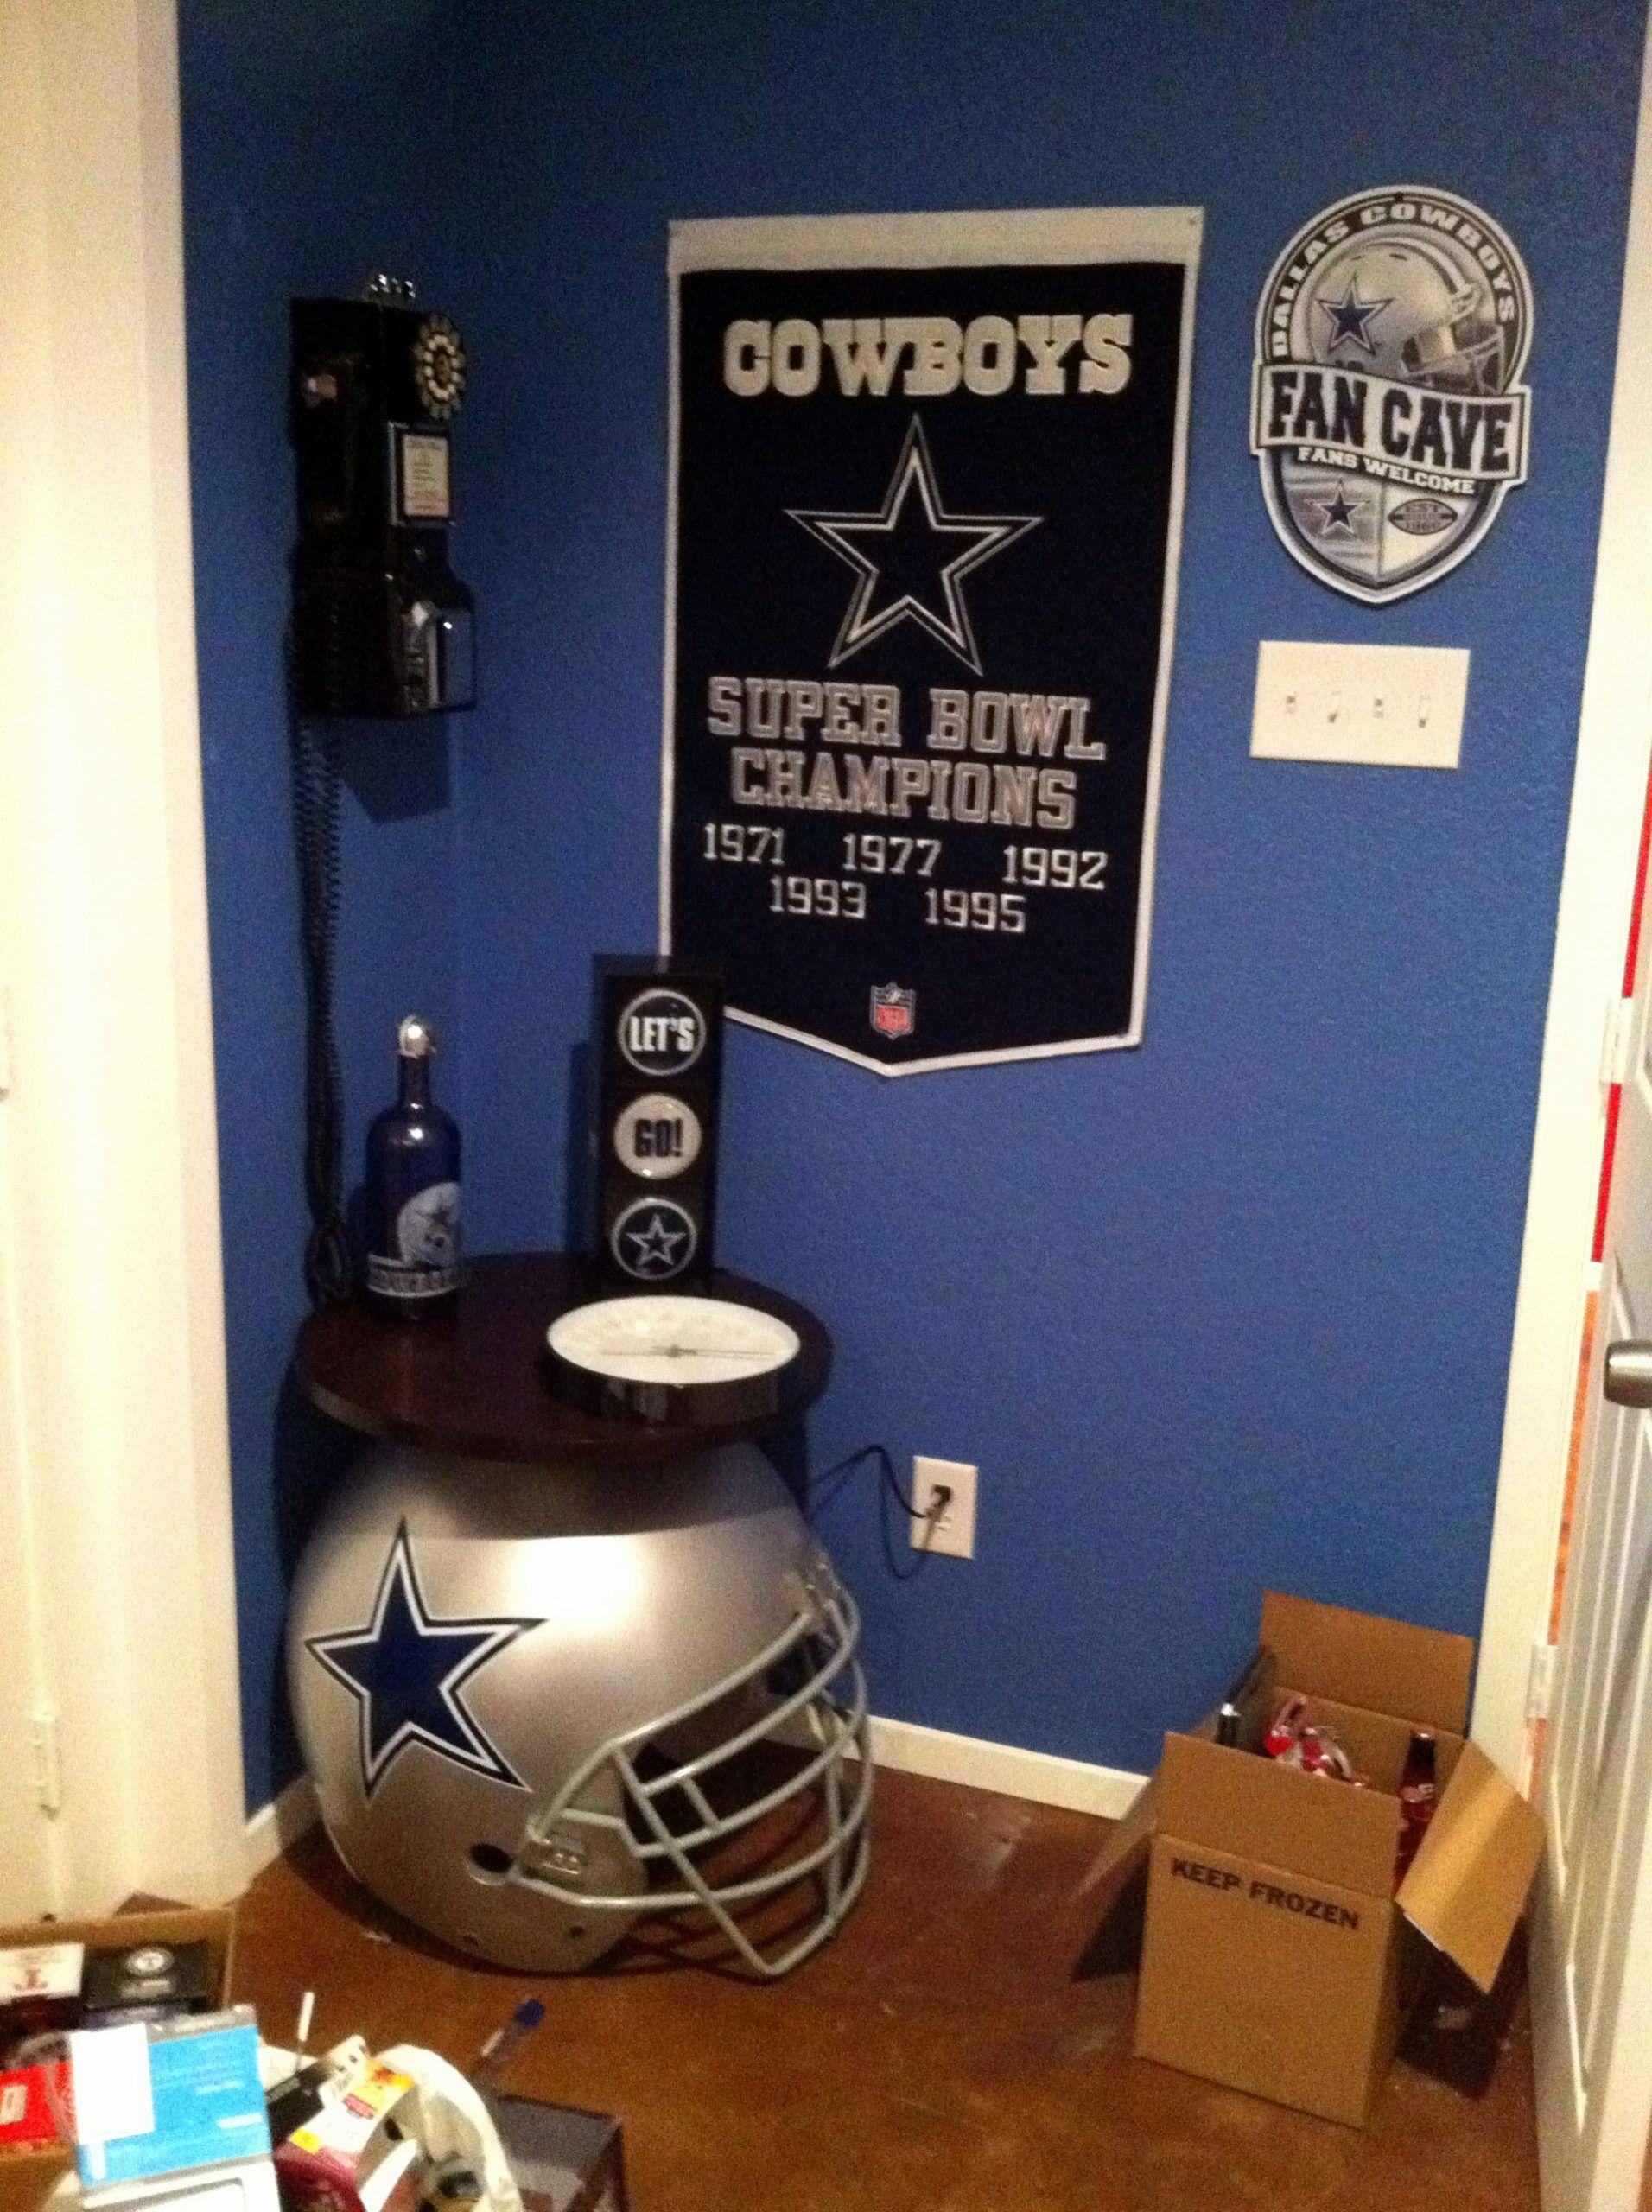 Dallas Cowboy Bathroom Decor Awesome Dallas Cowboys Game Room Decor Dallas Cowboys Decor Cowboy Bathroom Dallas Cowboys